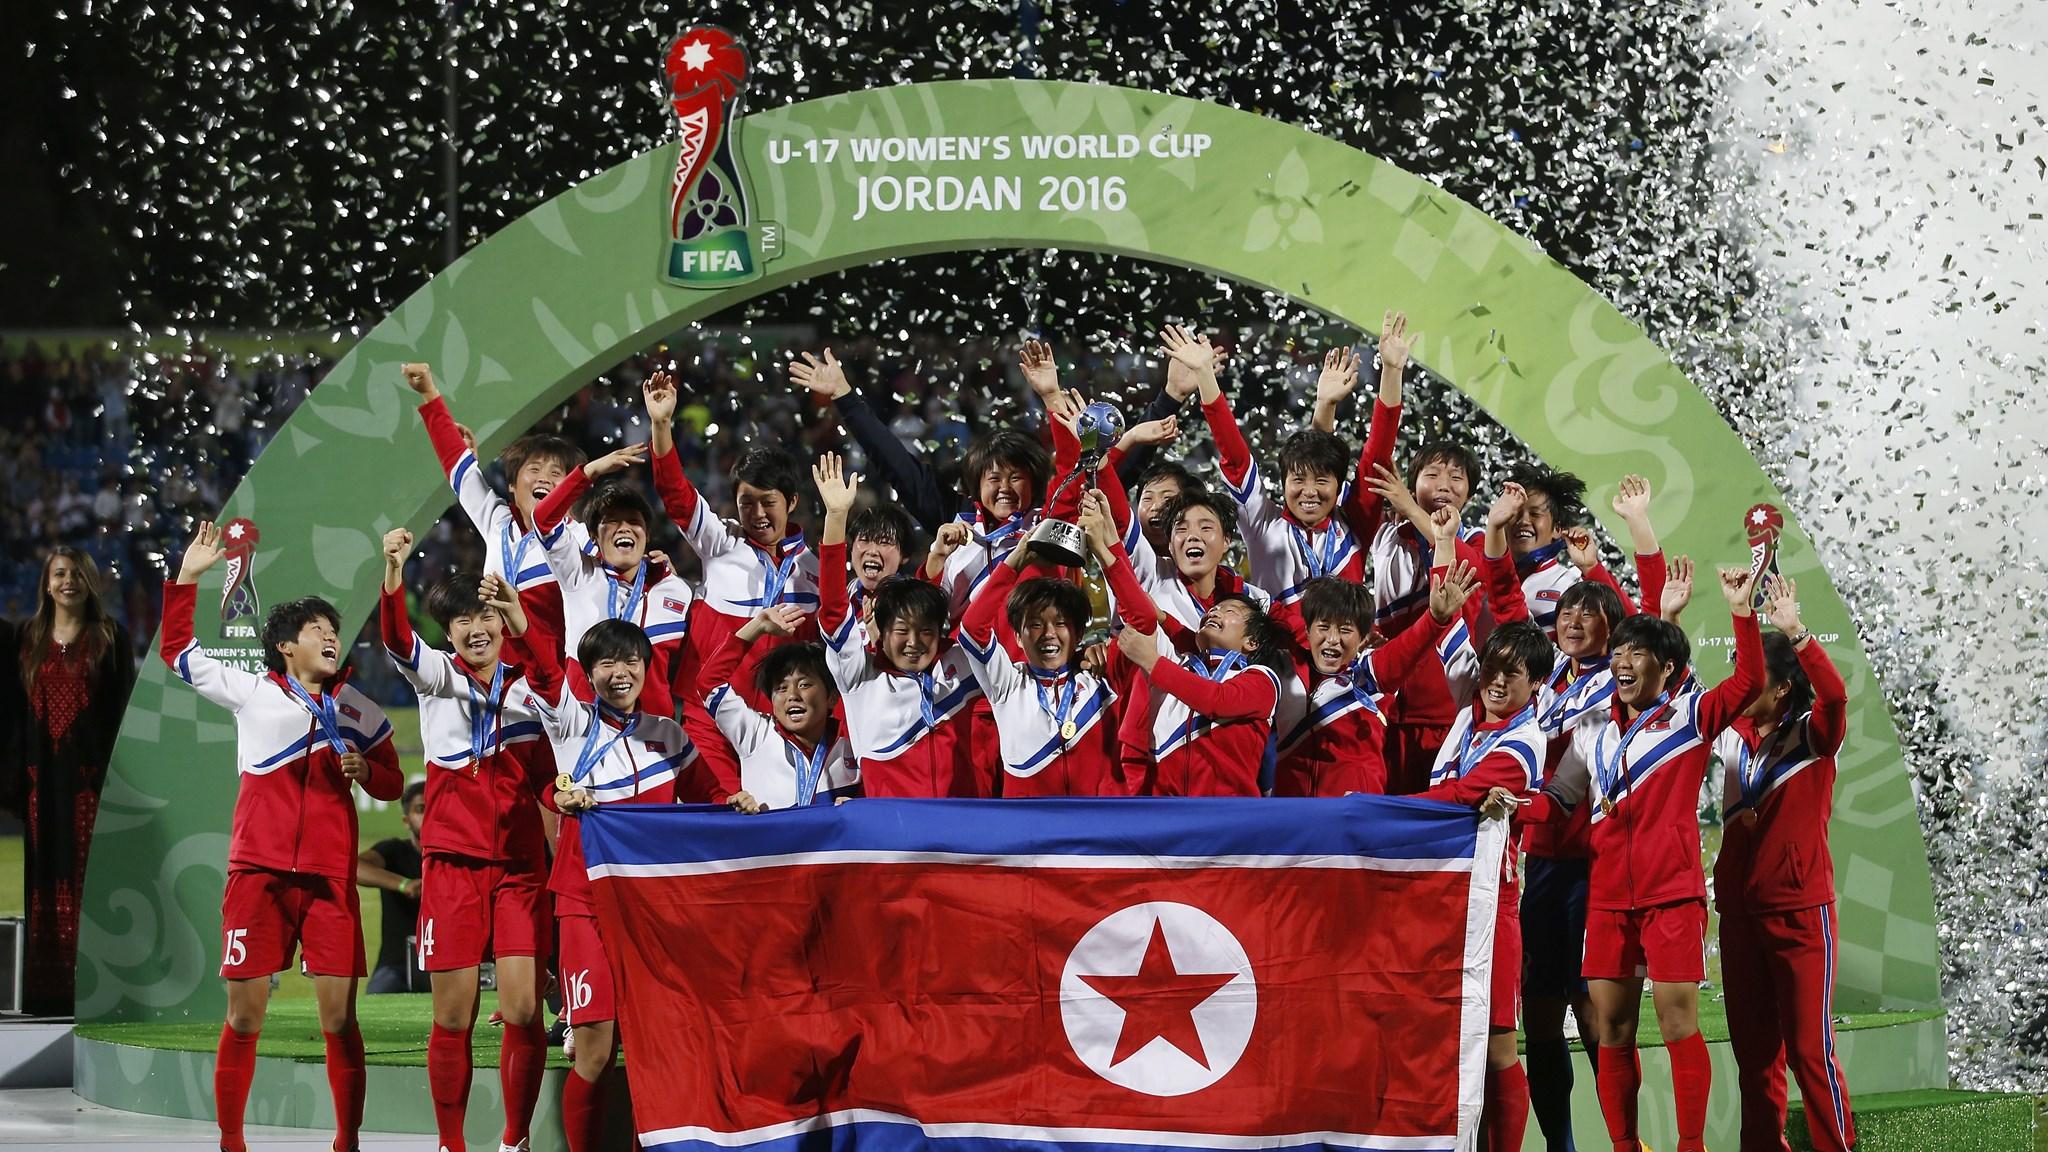 Copa do mundo de futebol feminino Archives - Olimpíada Todo Dia fd0da39ea7d4c